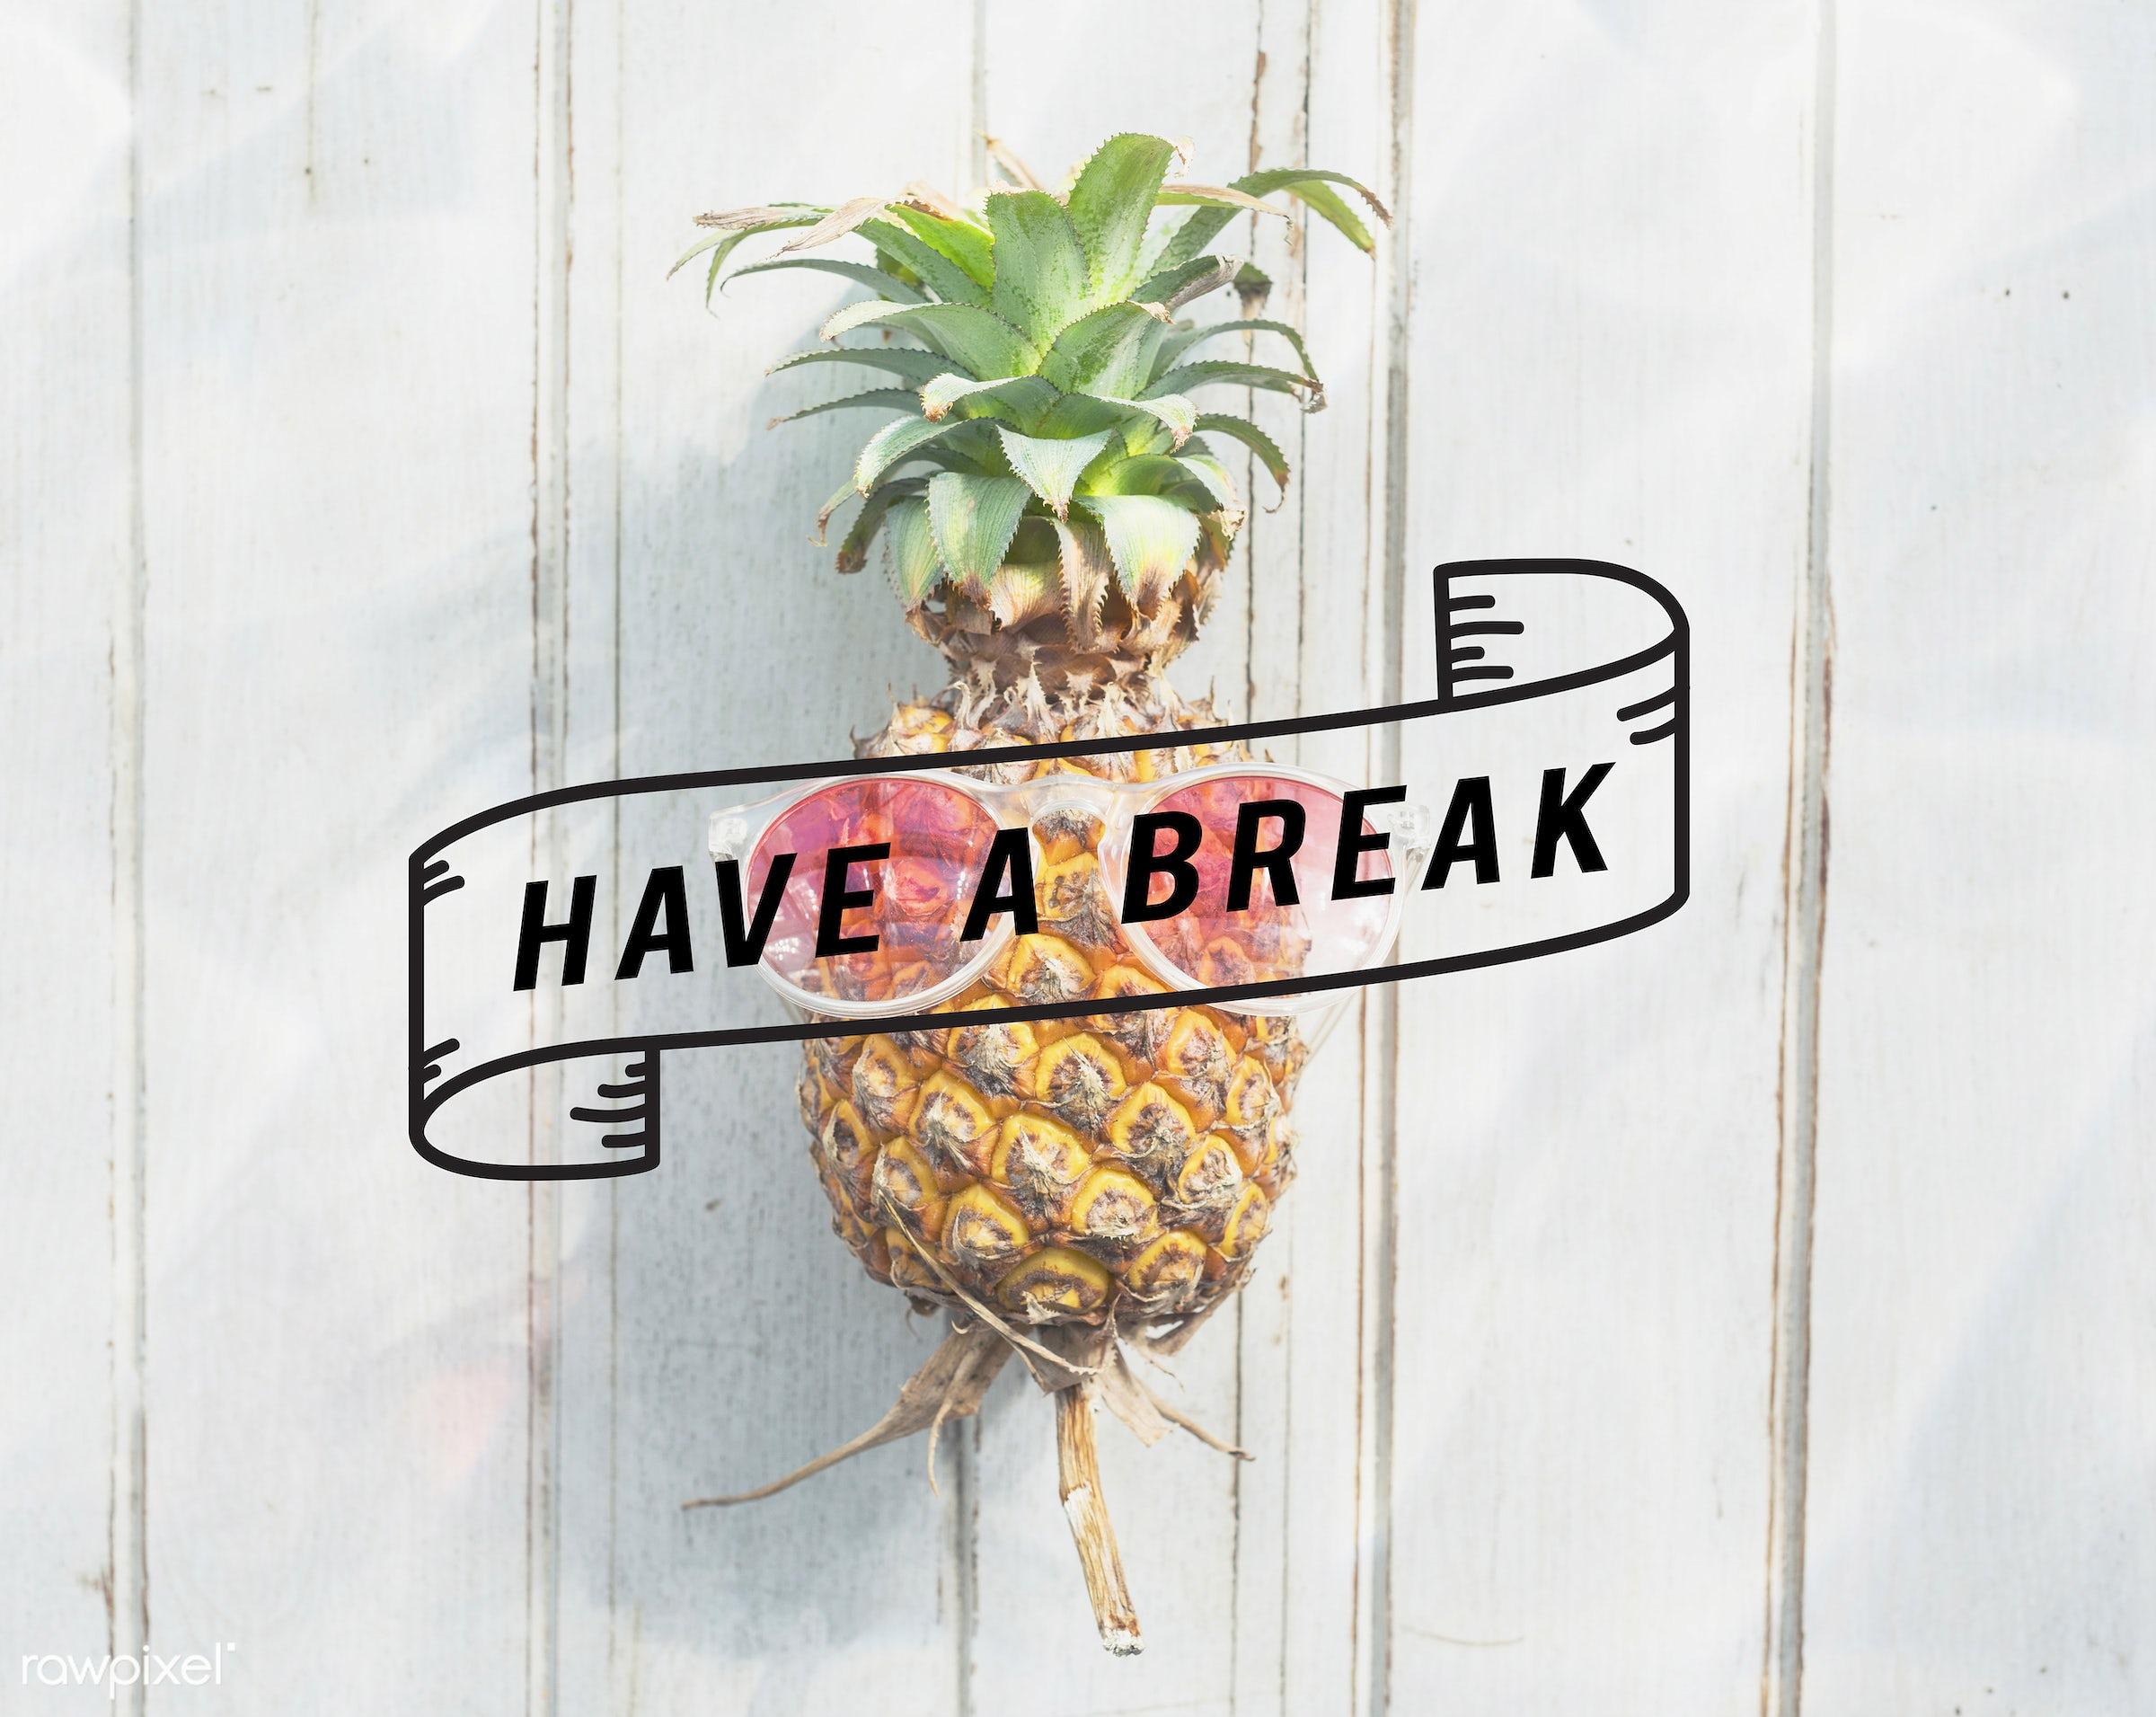 antioxidant, background, badge, beverage, break, caffeine, calmness, coffee, colorful, day, delicious, design, downtime,...